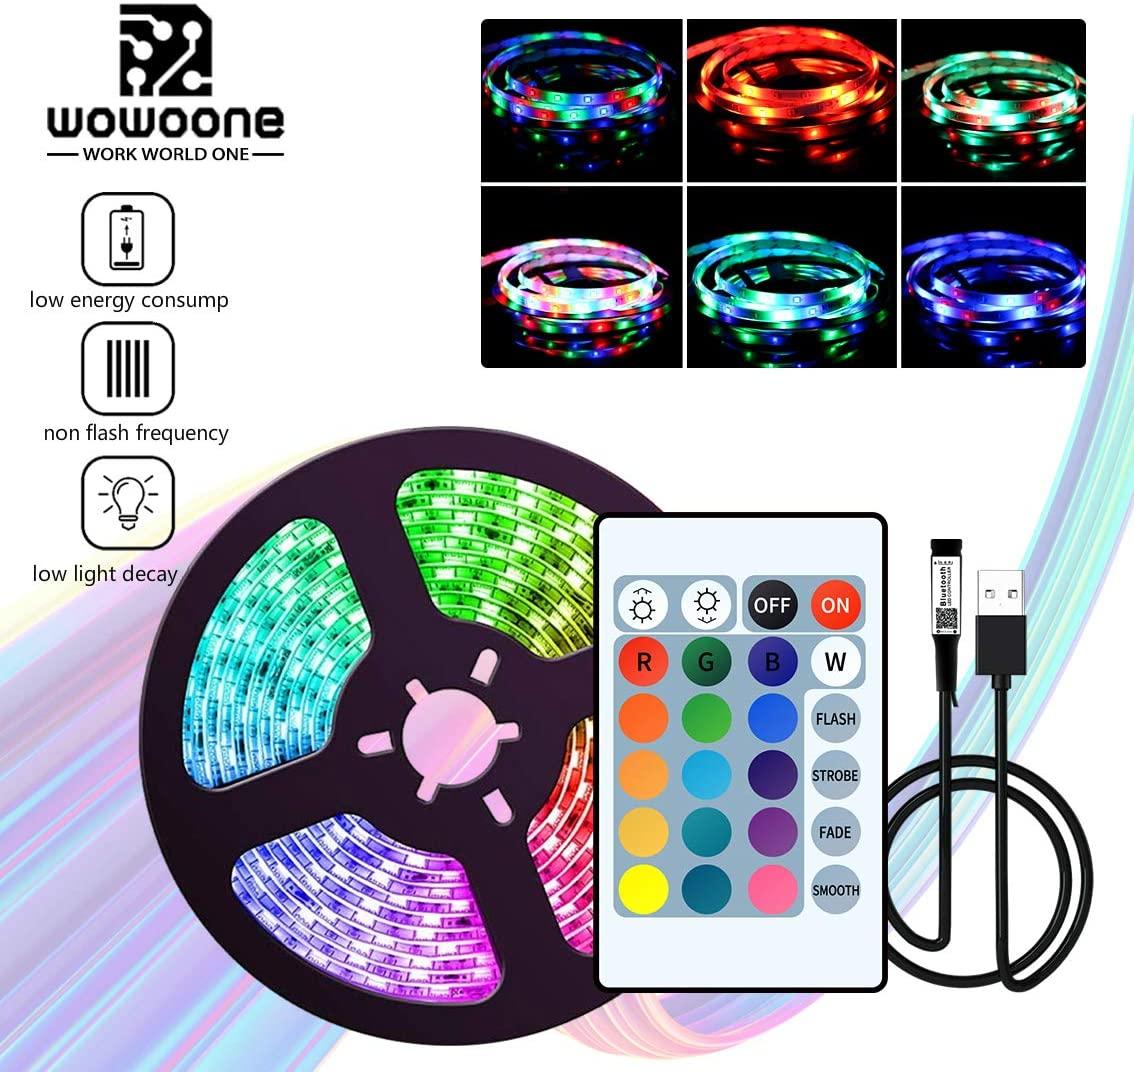 Eiechip 5V USB LED Strip Light 16.4ft,RGB TV Backlight 2835 Lighting for TV Room Holiday Decoration with 24 Keys Remote Controller